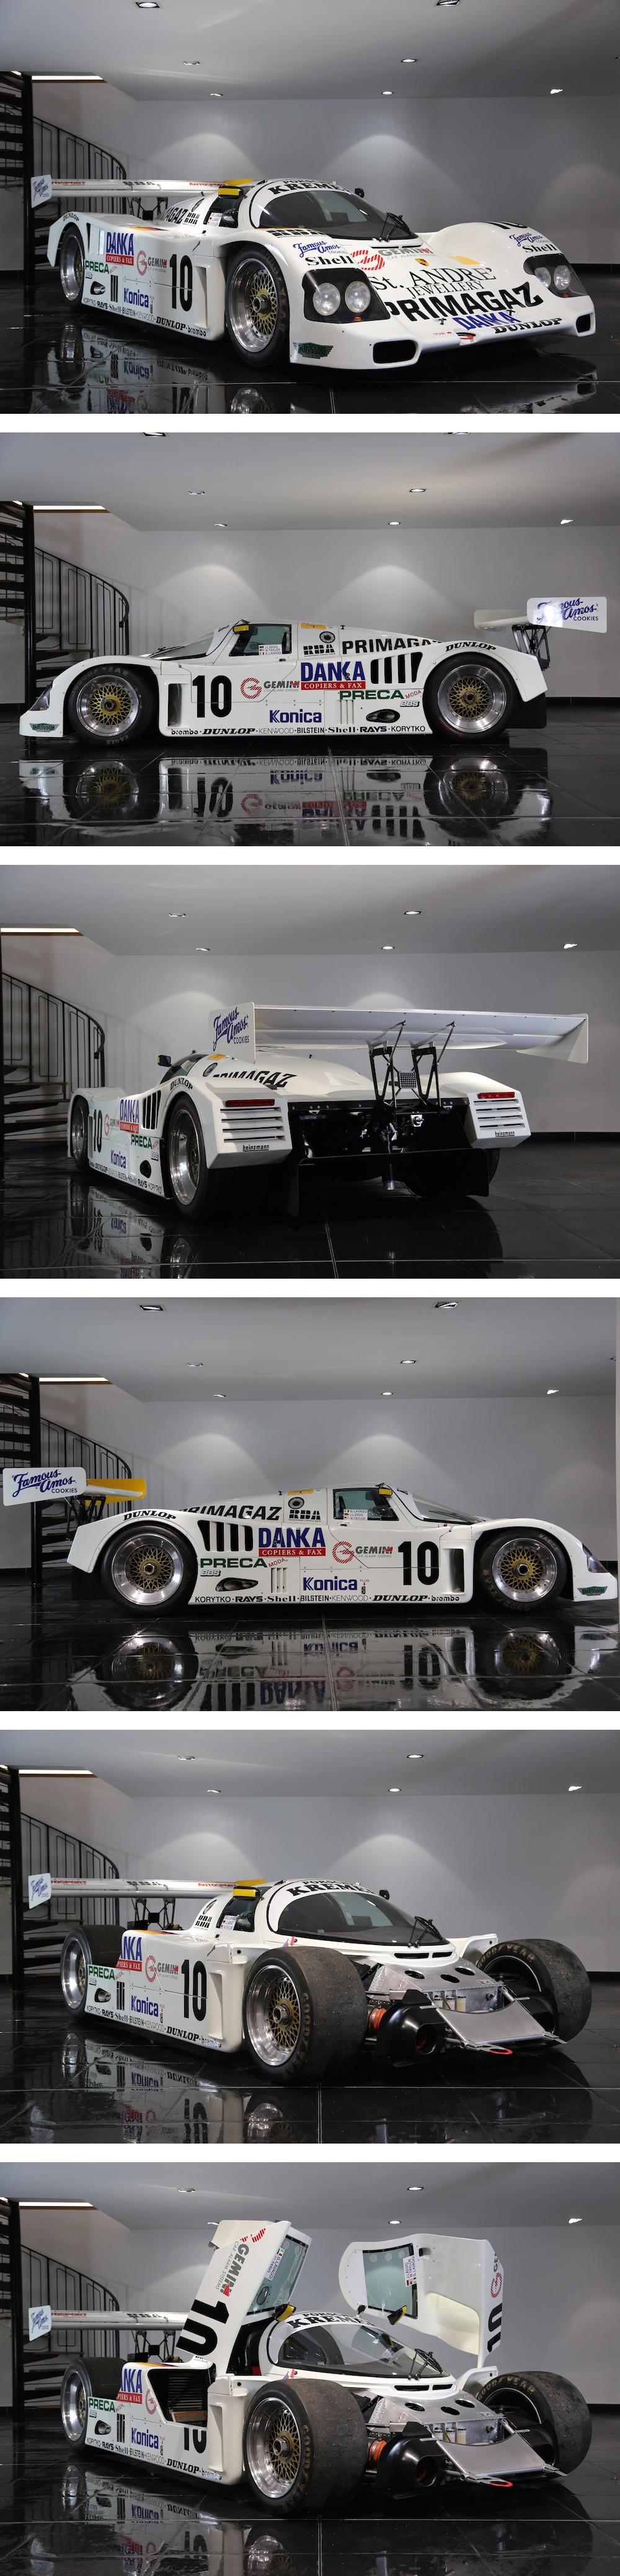 Porsche 962 LeMans